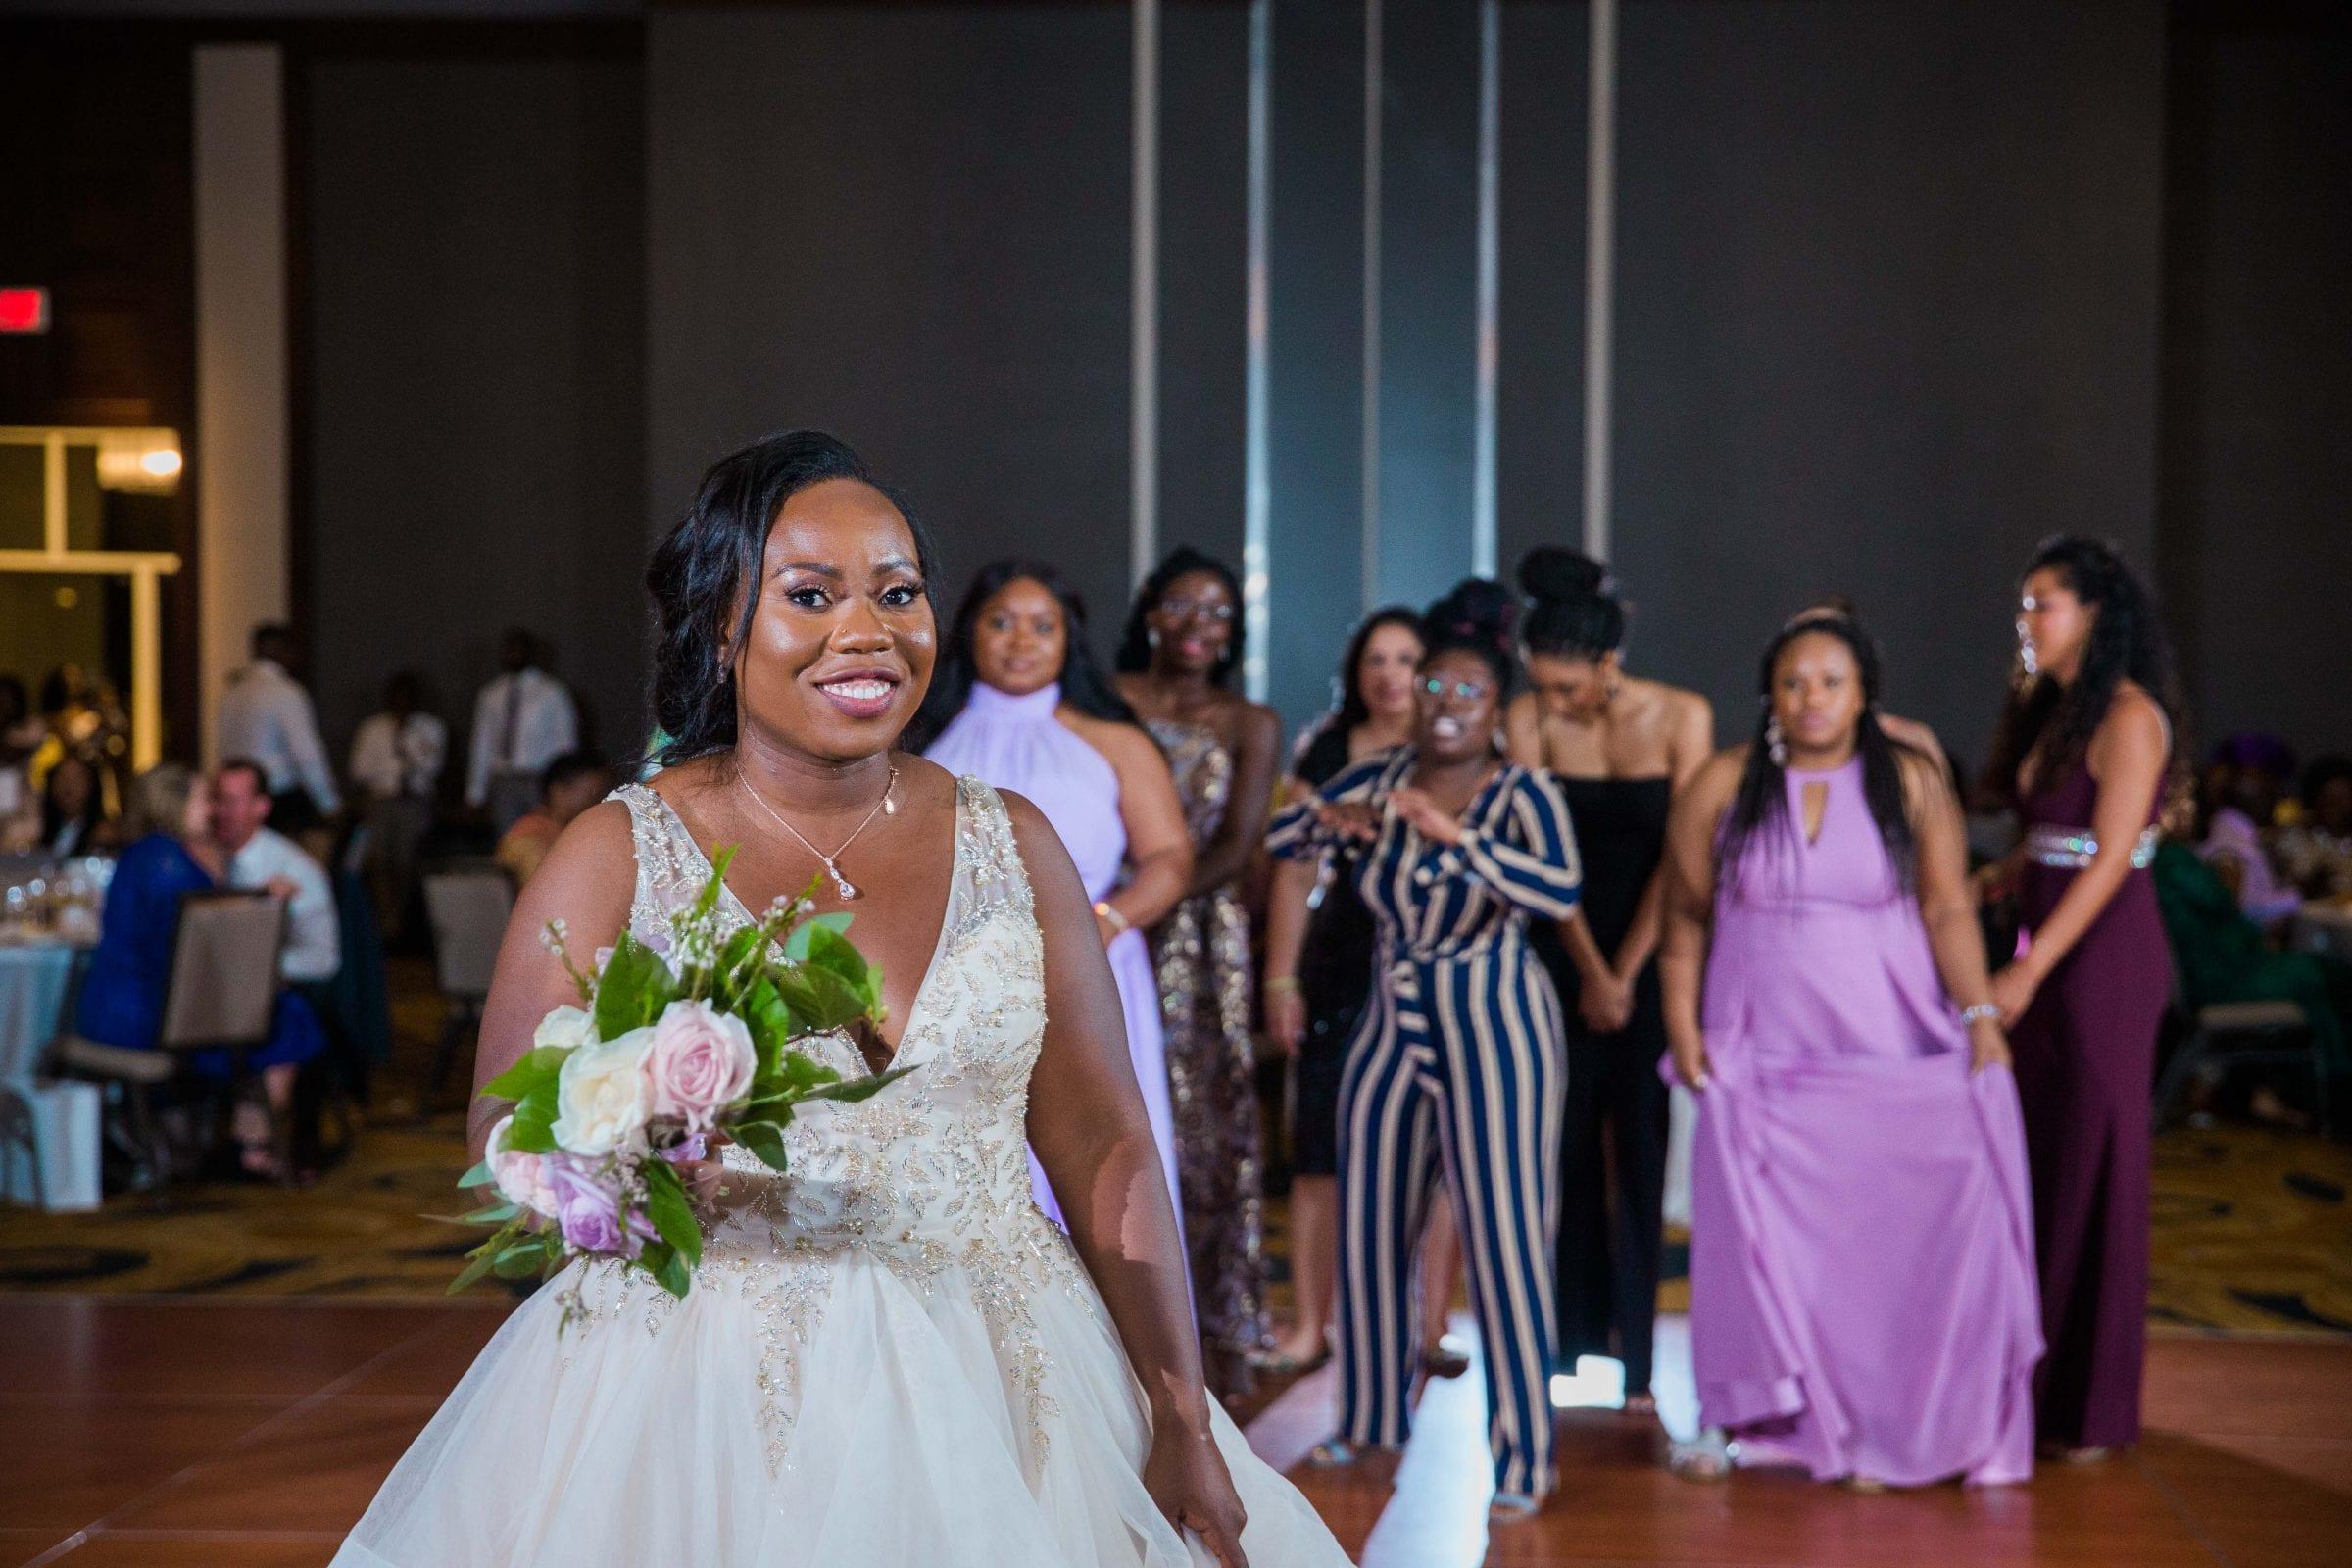 Onyema wedding La Cantera bouquet toss